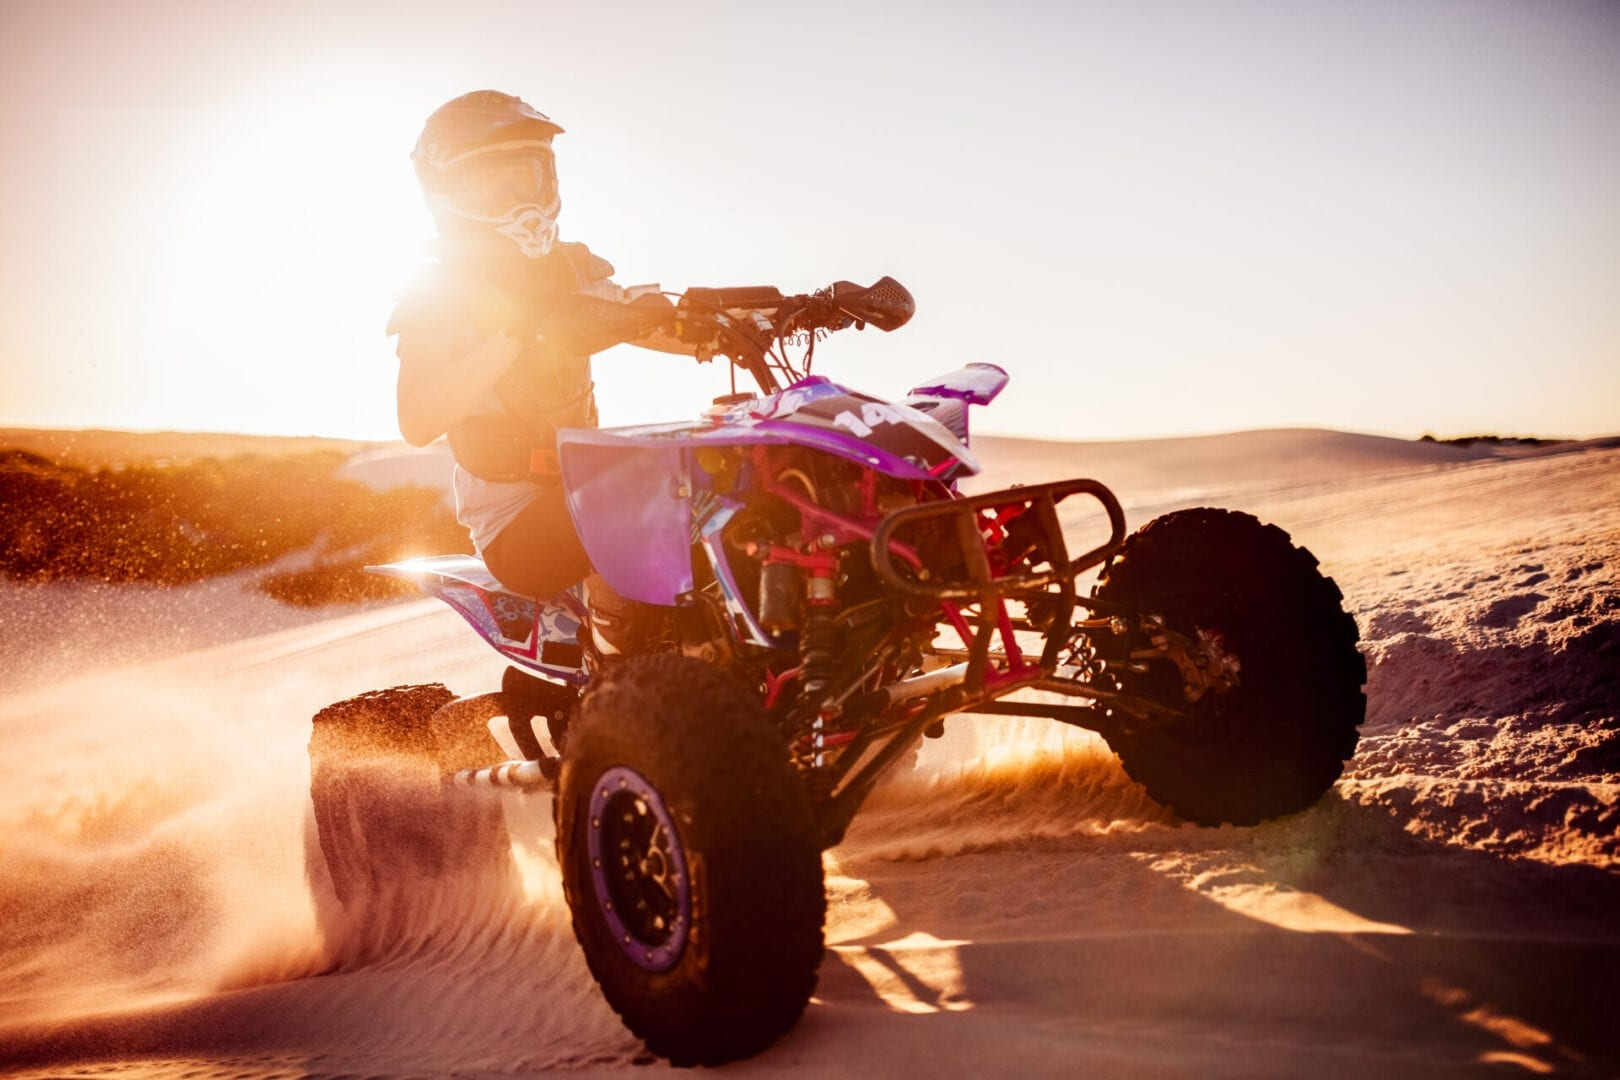 Quad biker in desert race with sun flare